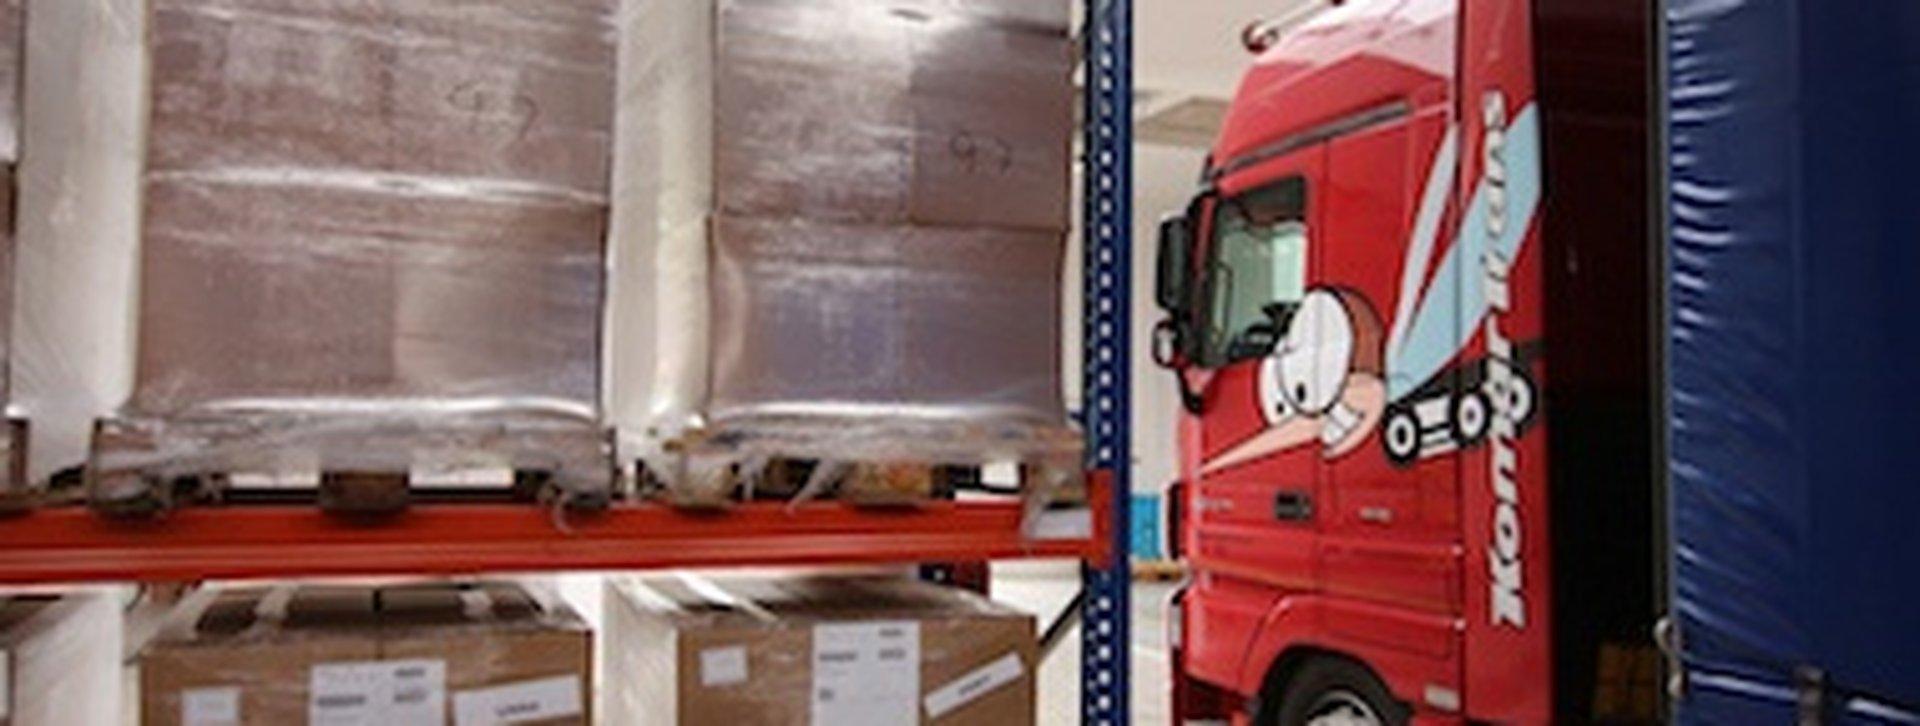 Sklad + logistické služby